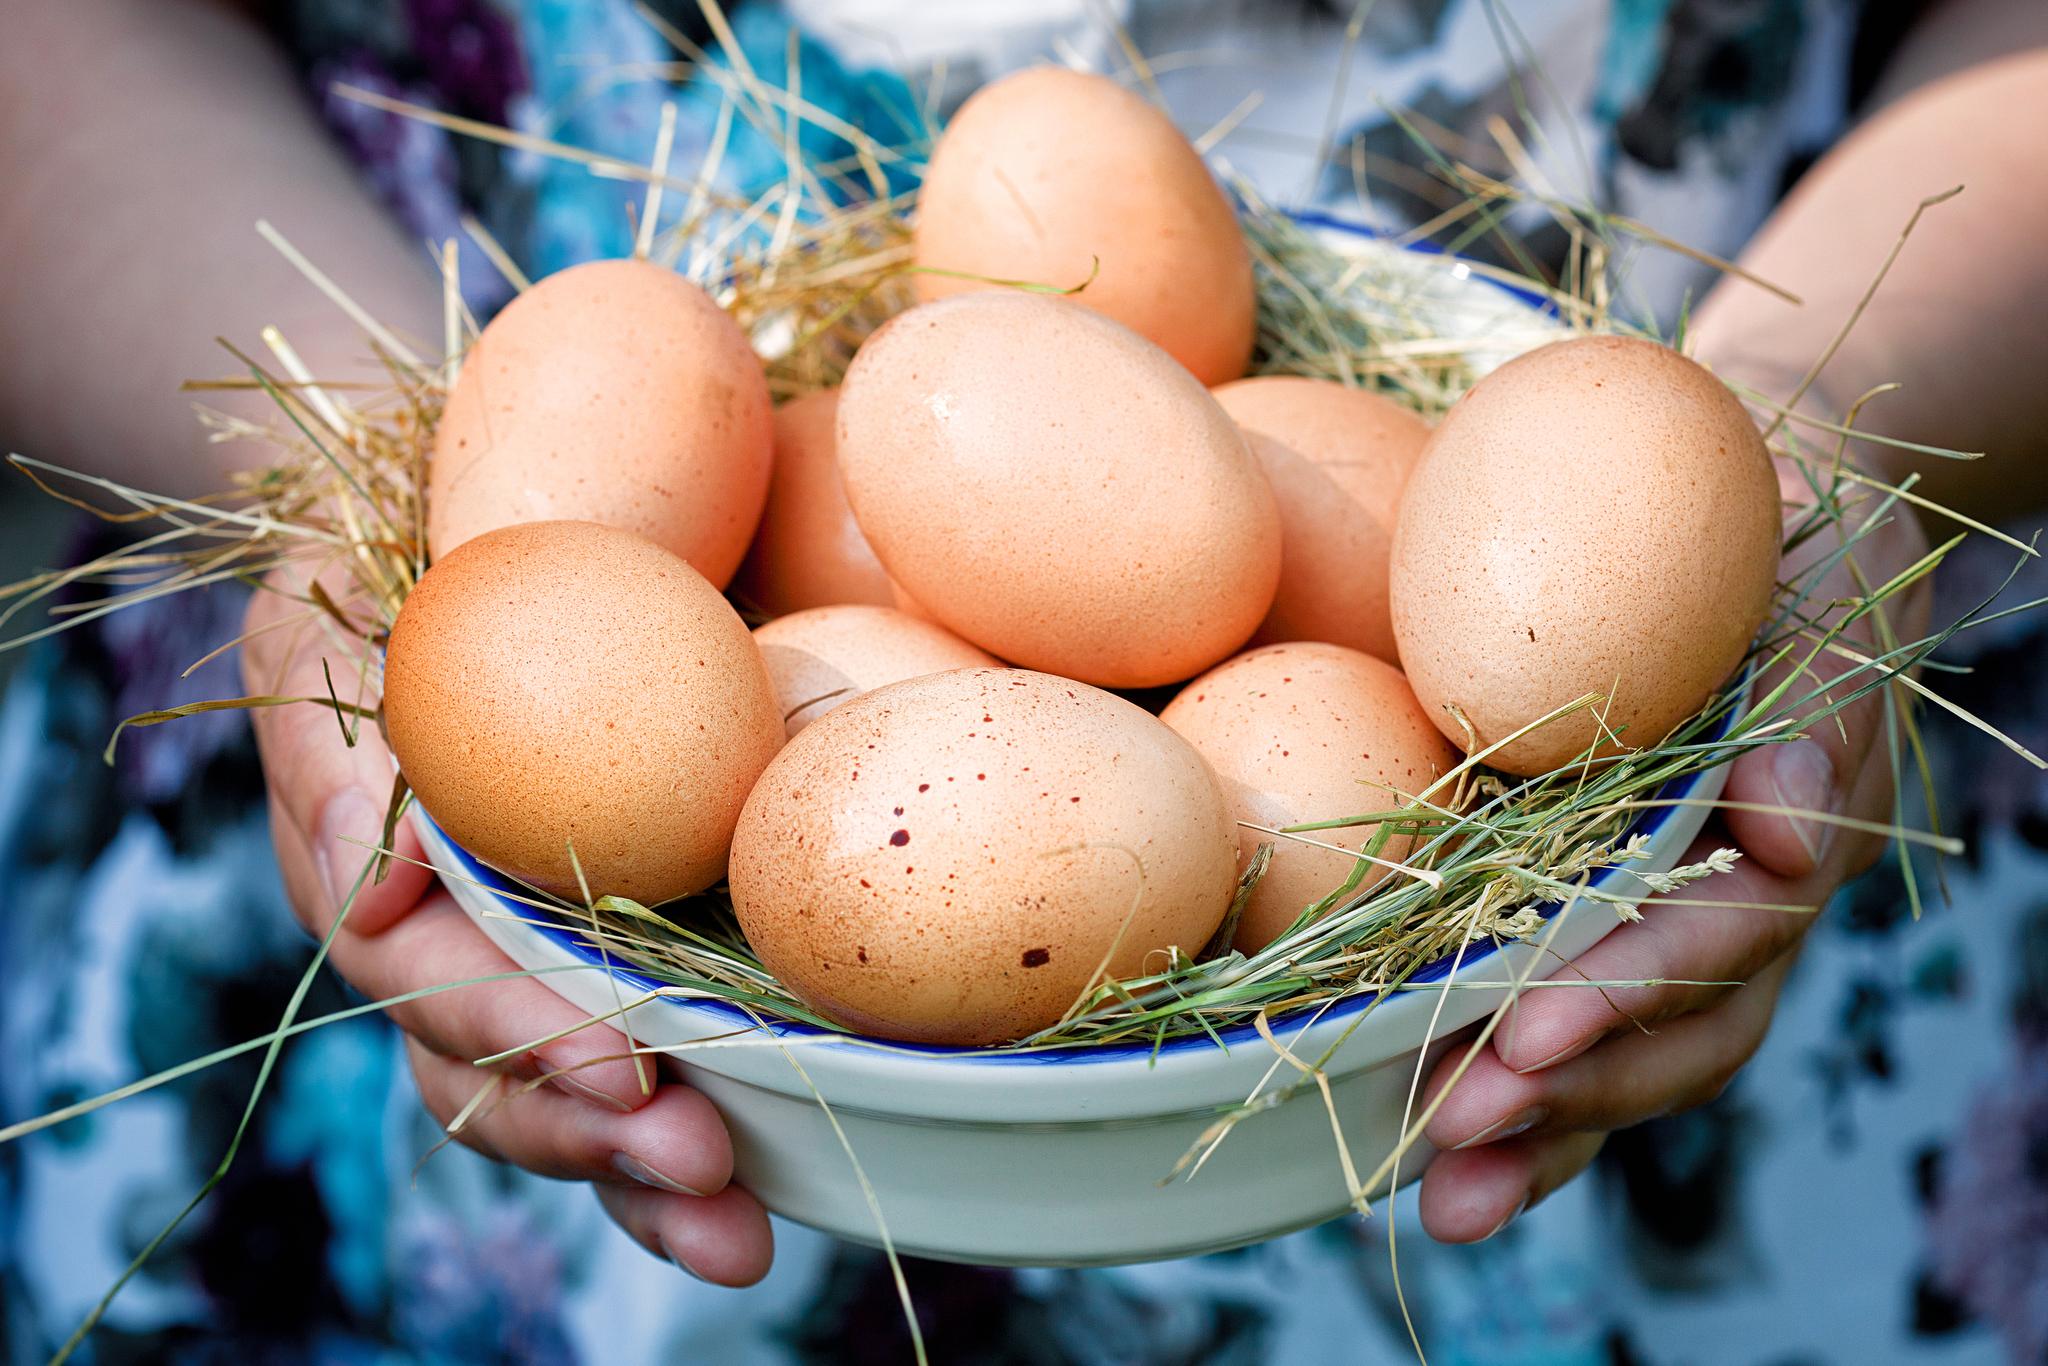 Kogu munade kaalulangus soomine